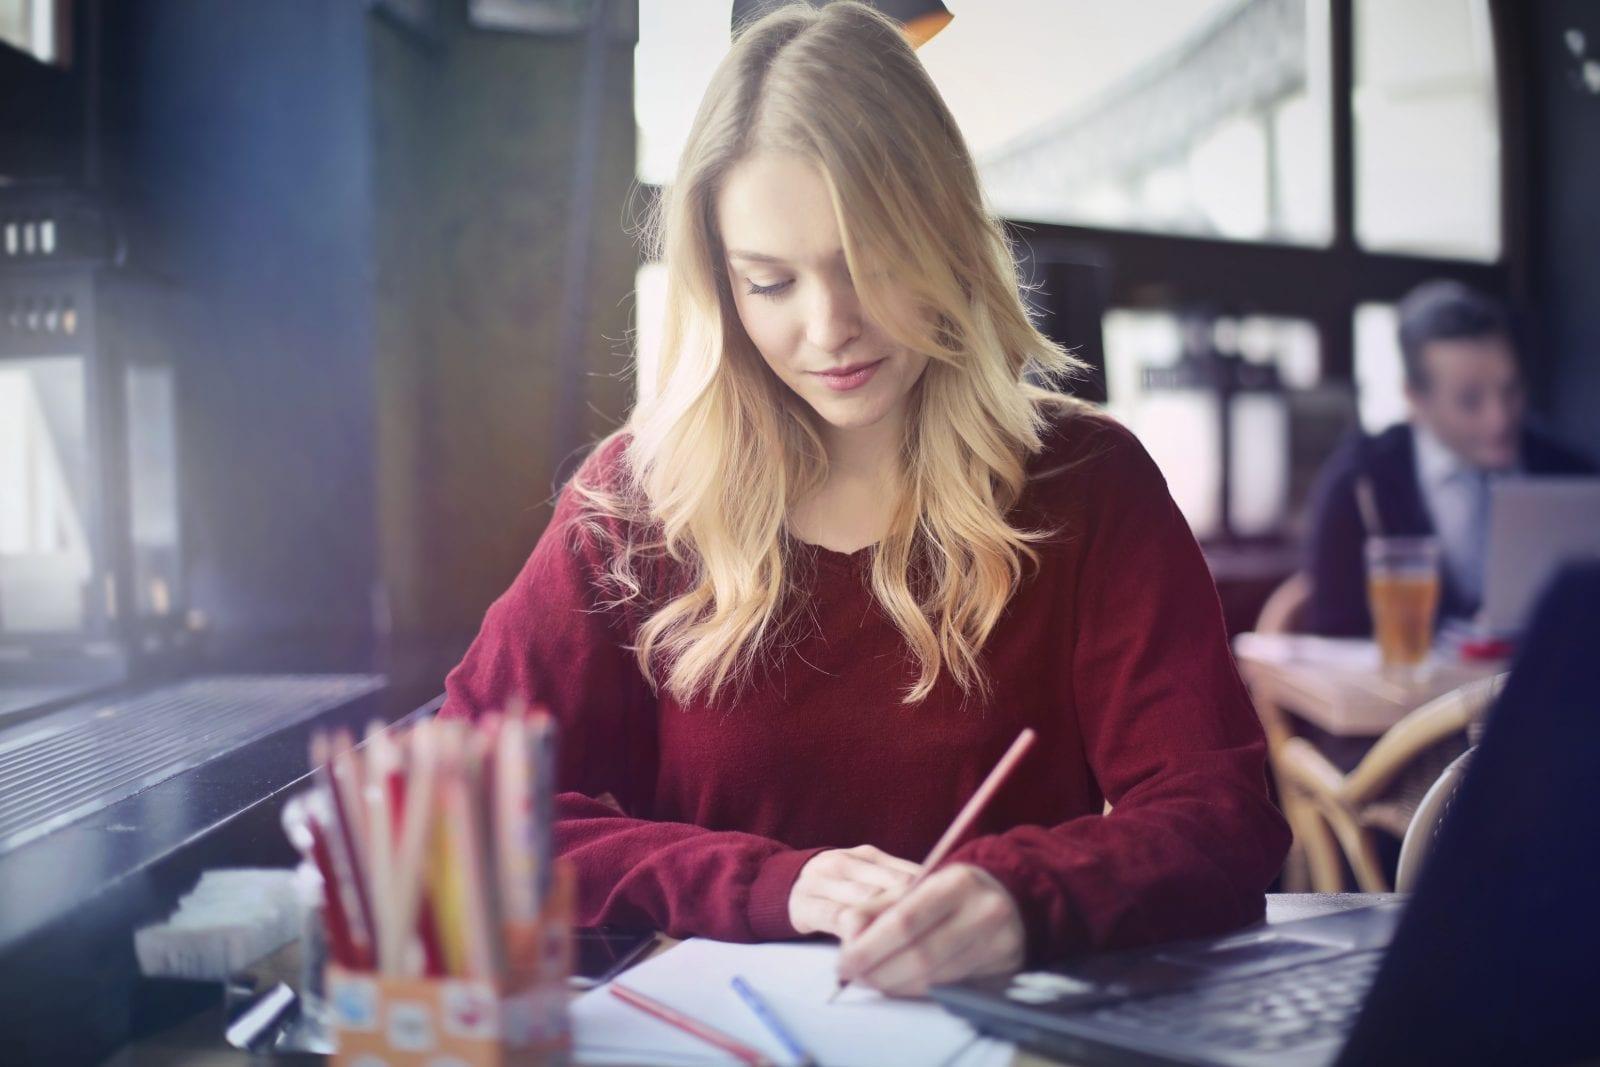 How to write essay describing yourself